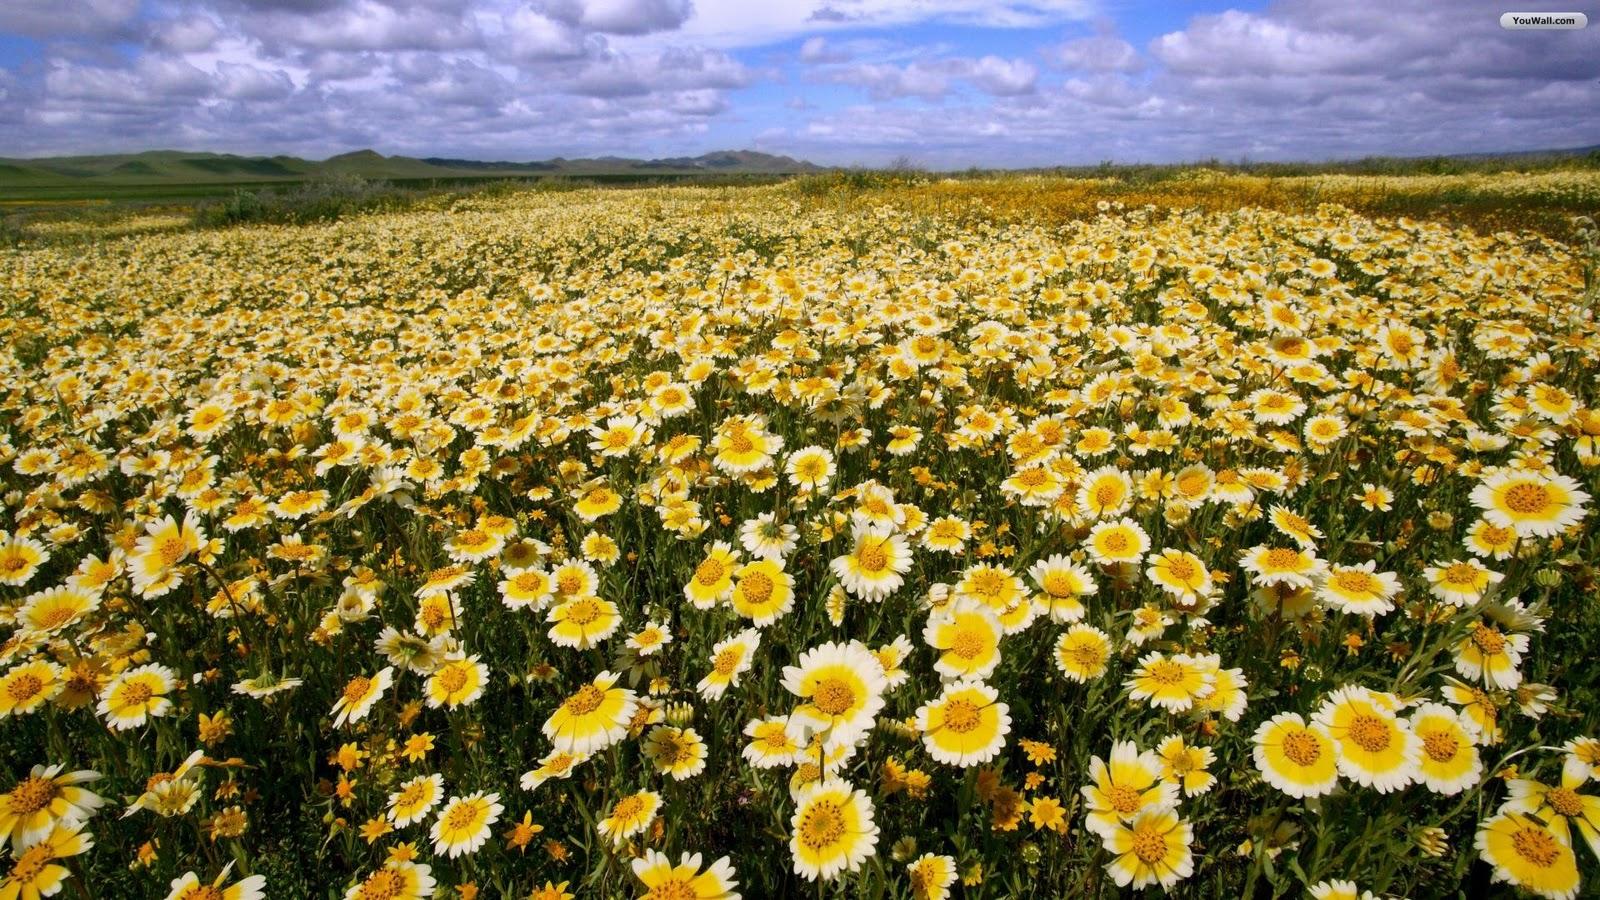 http://1.bp.blogspot.com/_UdUDH_BCTj4/TMyS_7UyO0I/AAAAAAAAAGM/vZeC-lufDe8/s1600/flowers_wallpaper_ecb33.jpg